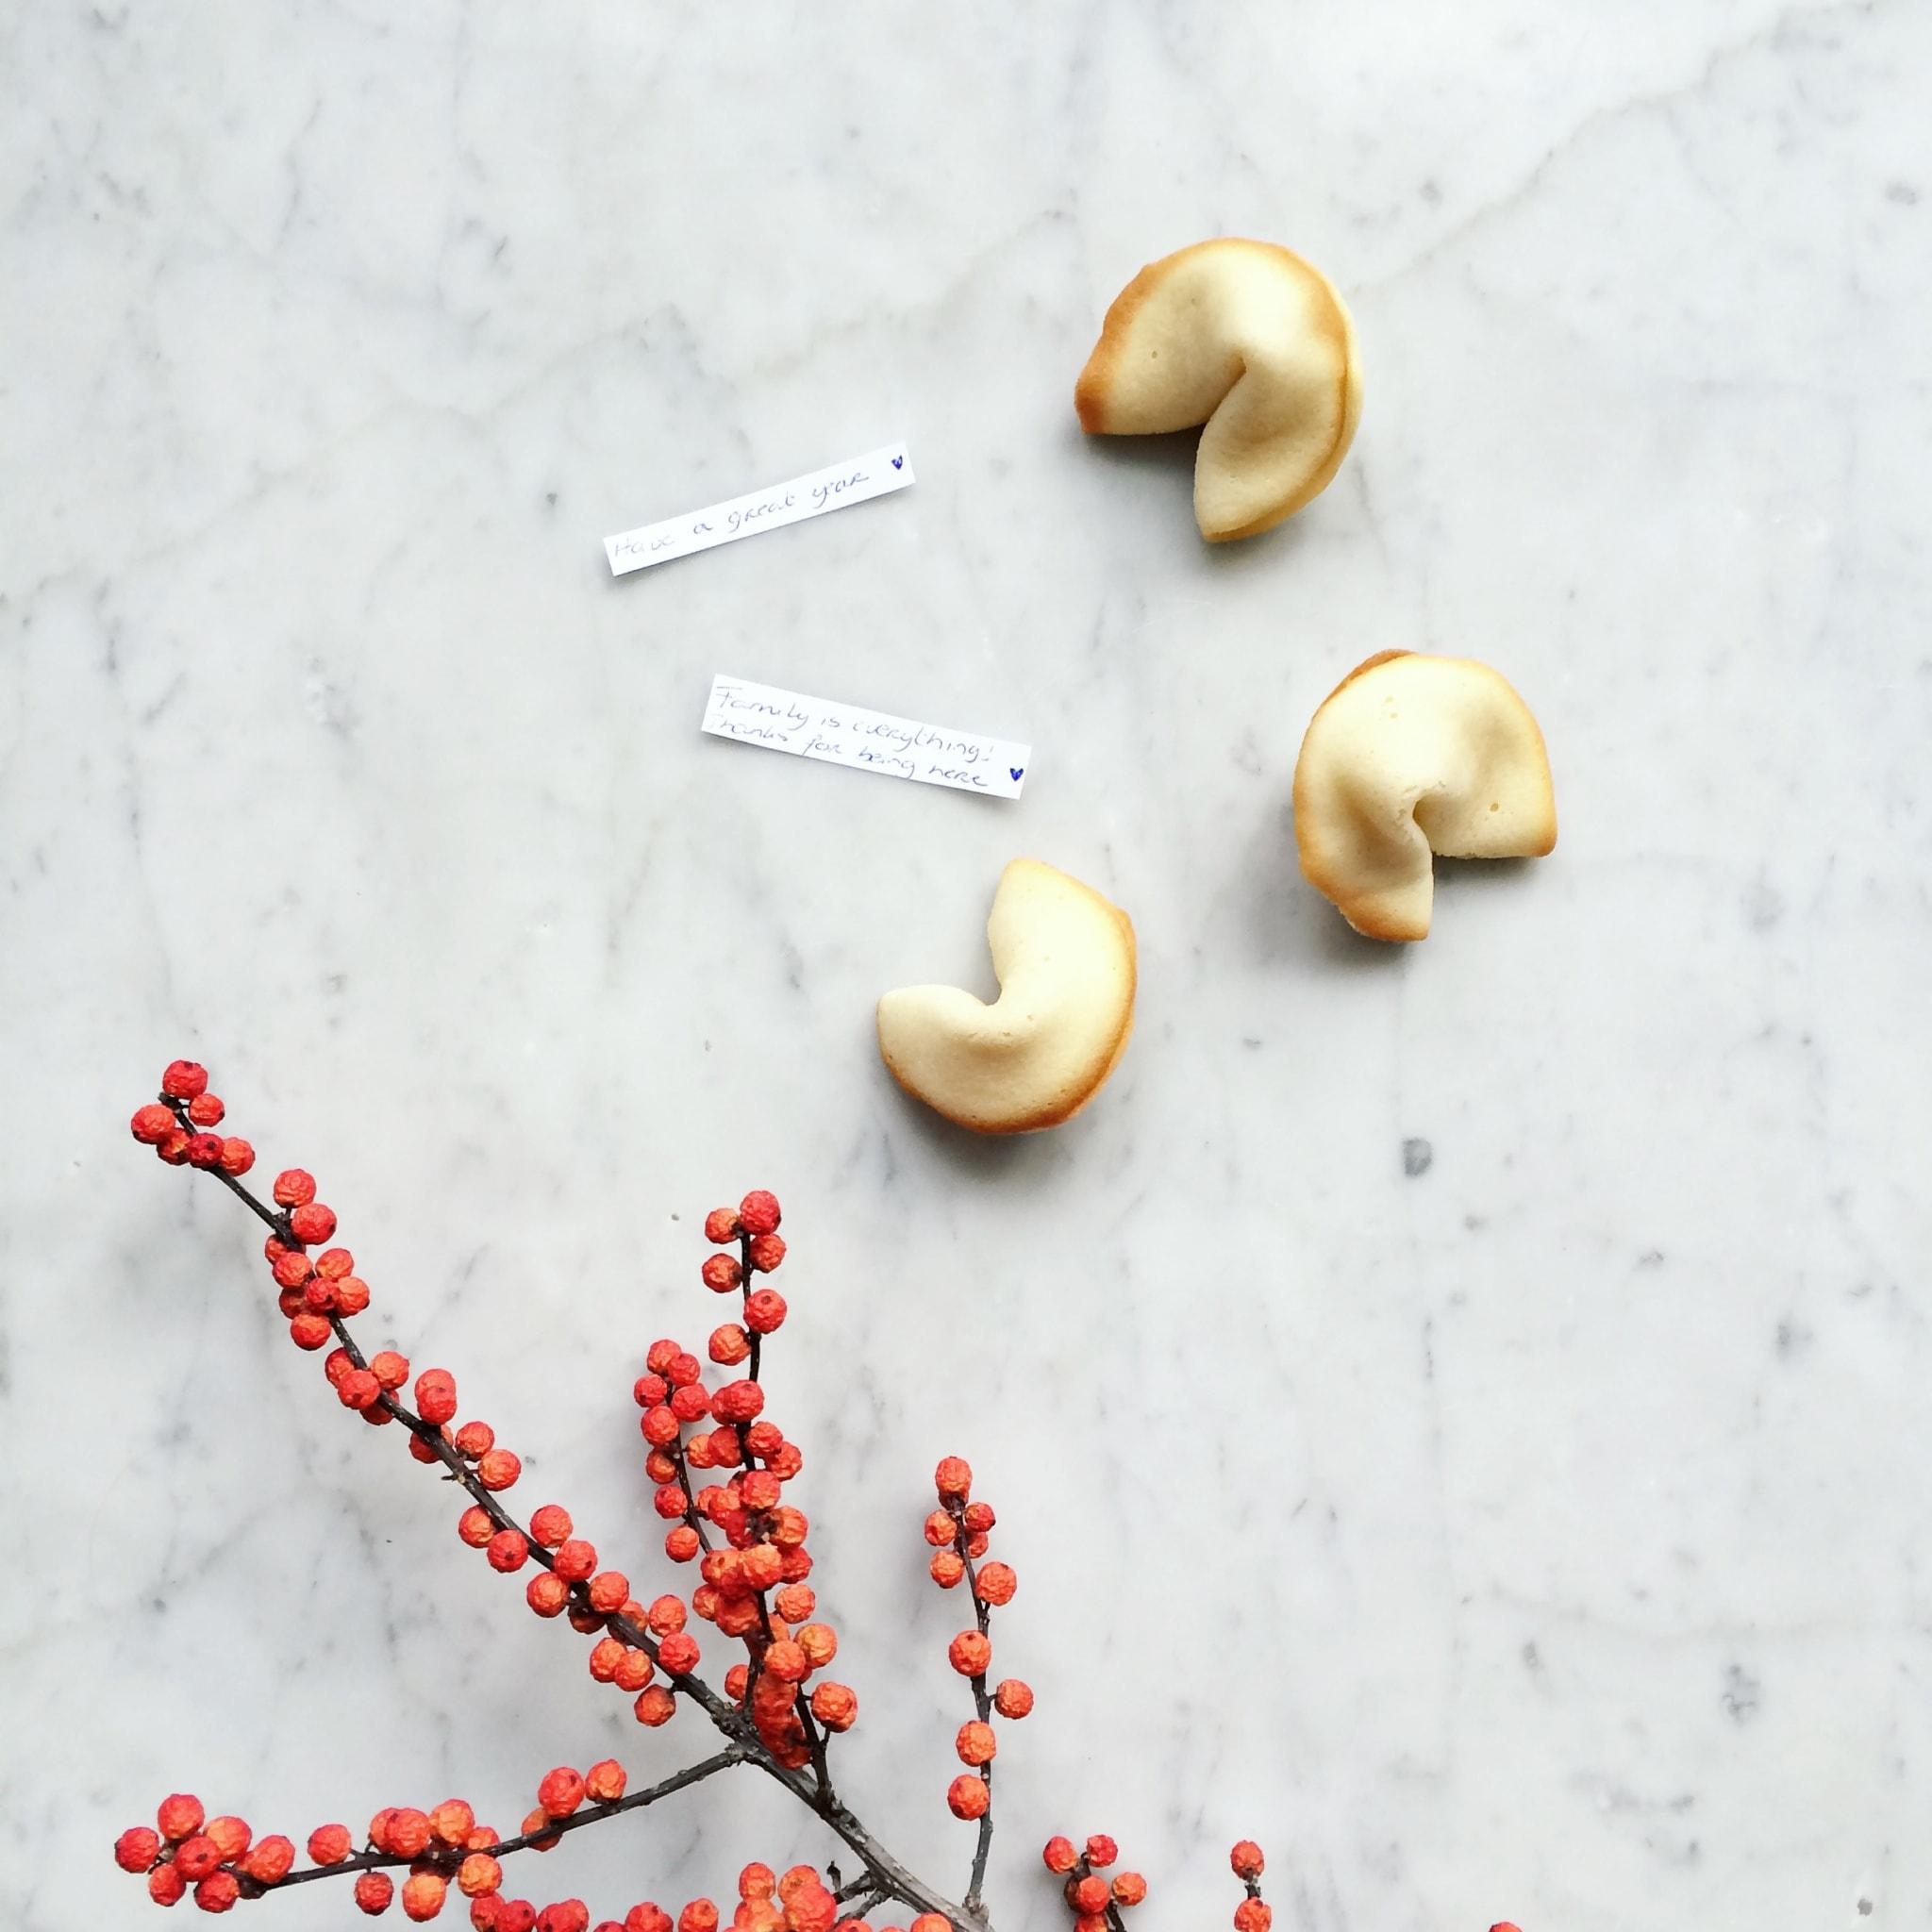 IMG 2625 - Recept Chinese gelukskoekjes